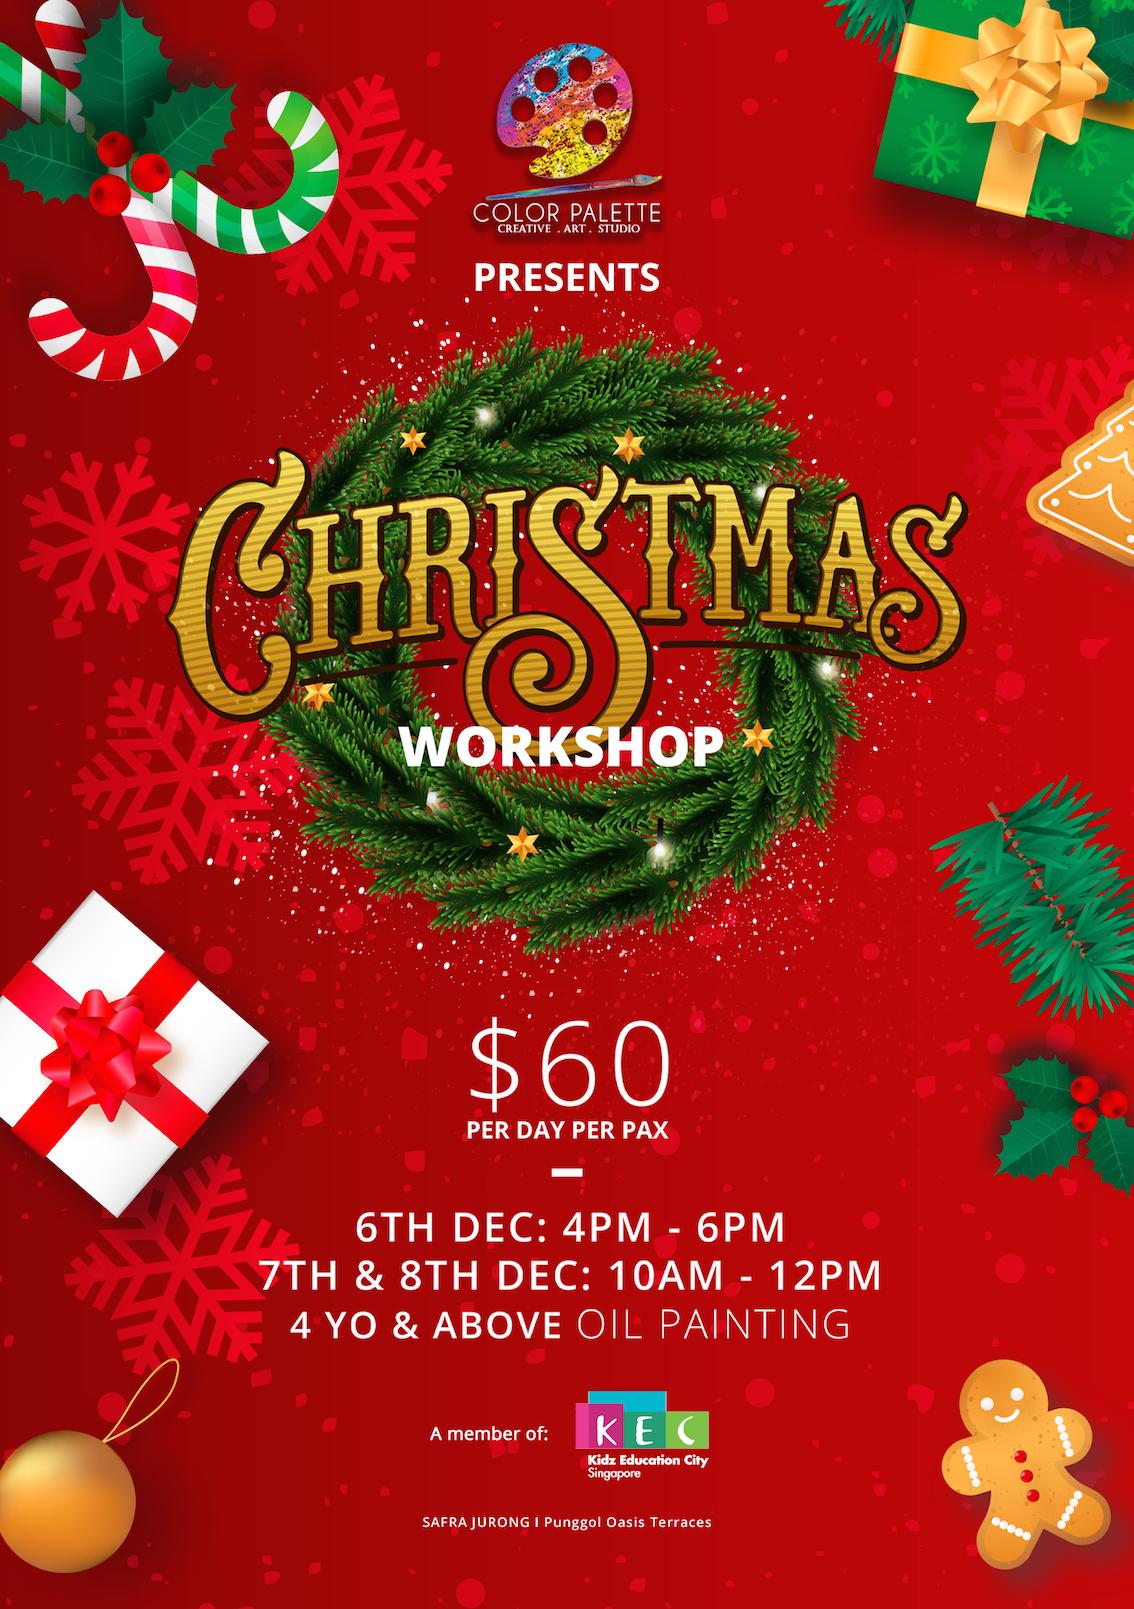 Copy of Artistic Christmas Workshop